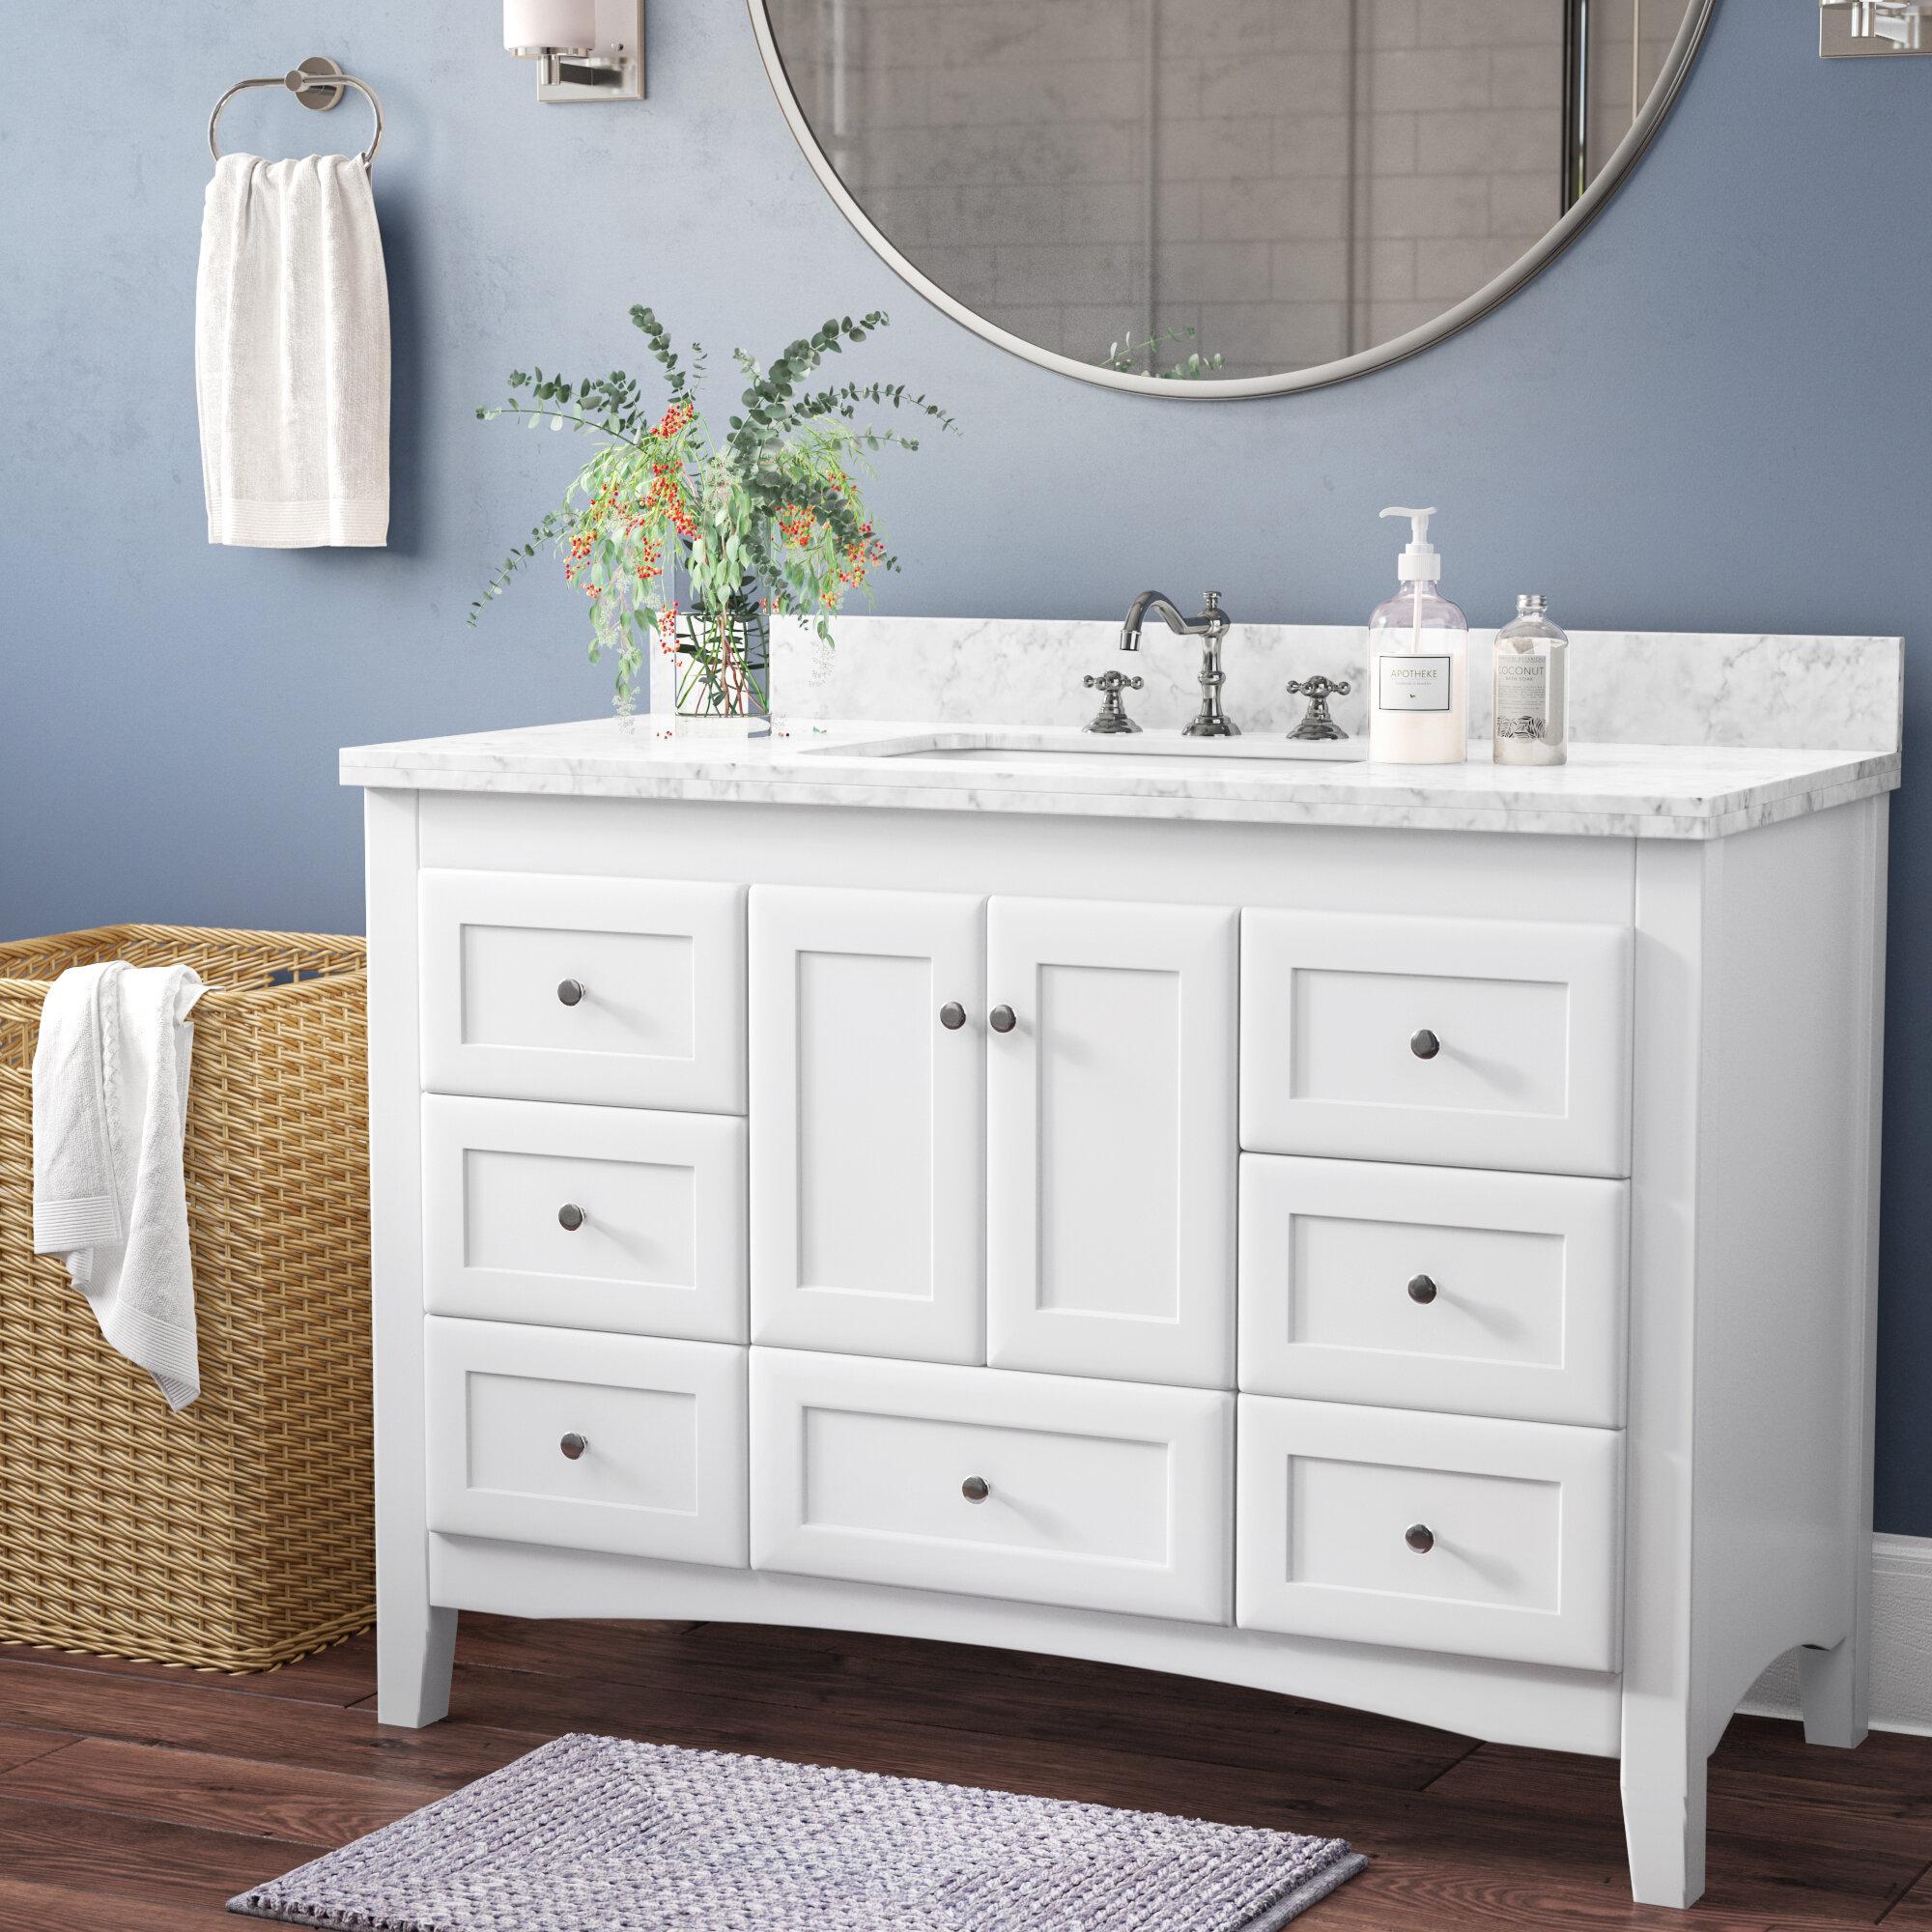 Farlend 48 Single Bathroom Vanity Set